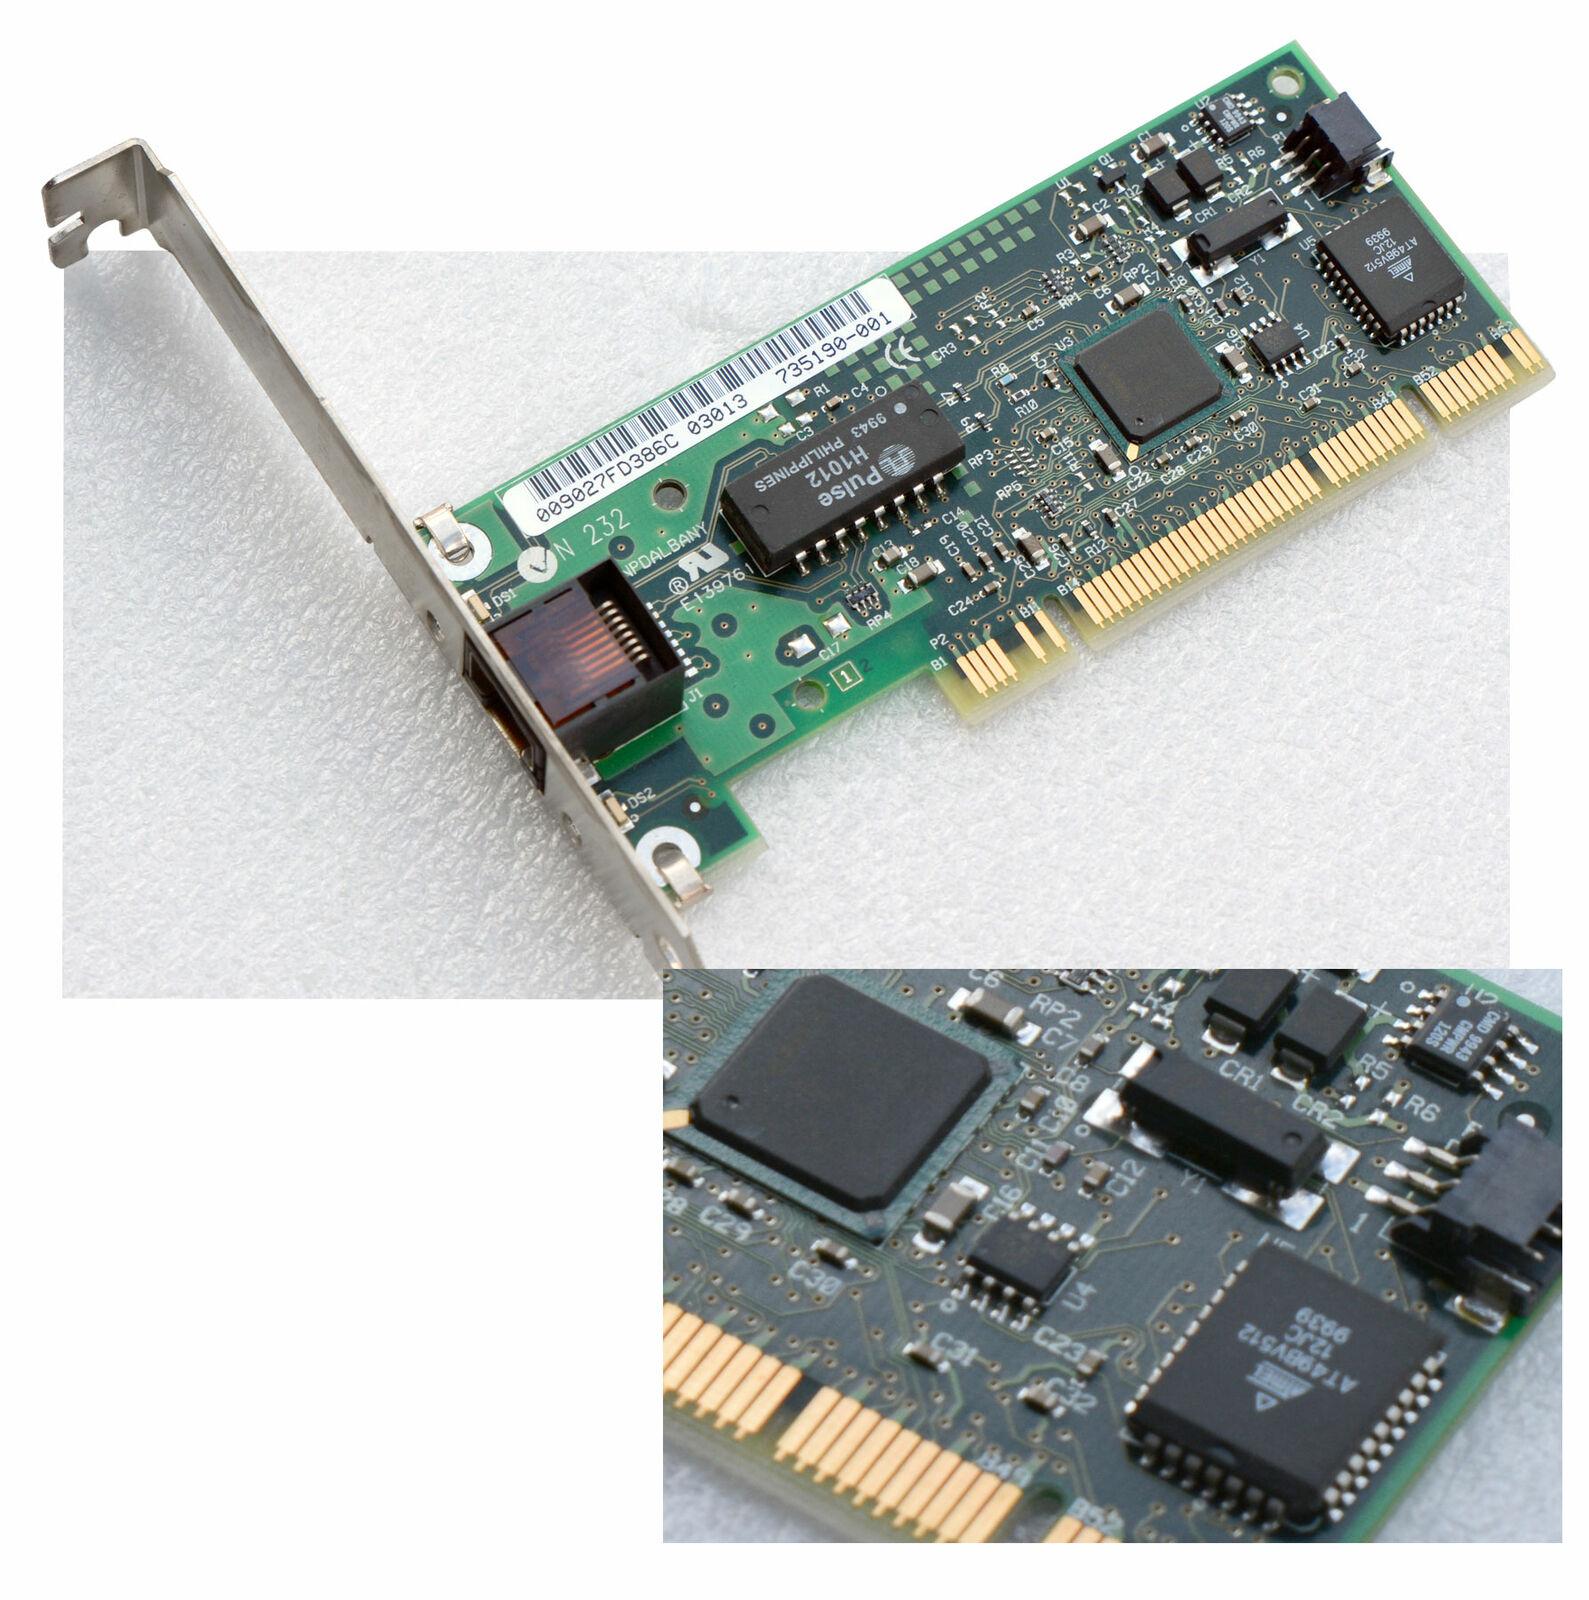 Network Card Intel PCI 10/100 PILA8470 F & Windows 95 98 2000 XP 7 Bootrom V110W